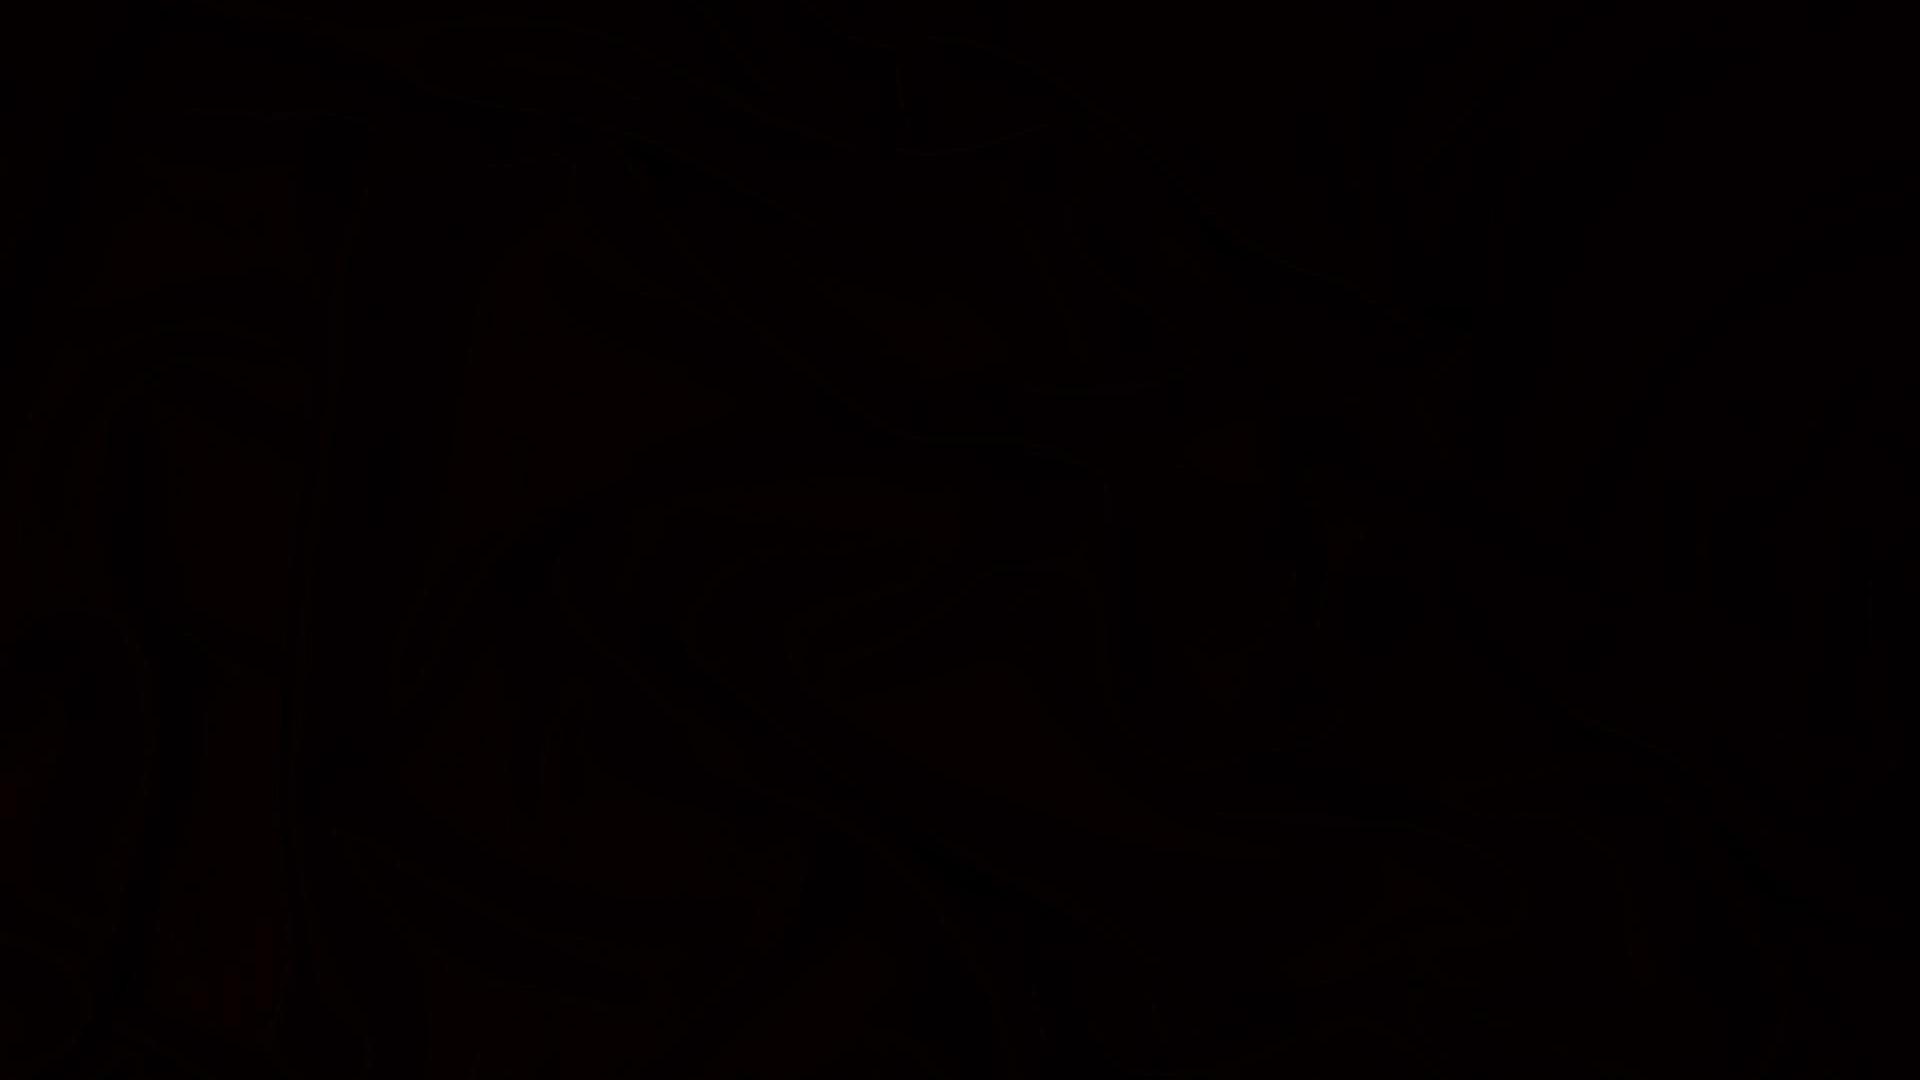 Best Hd Dark Wallpapers Pure Black Wallpaper 66 Images